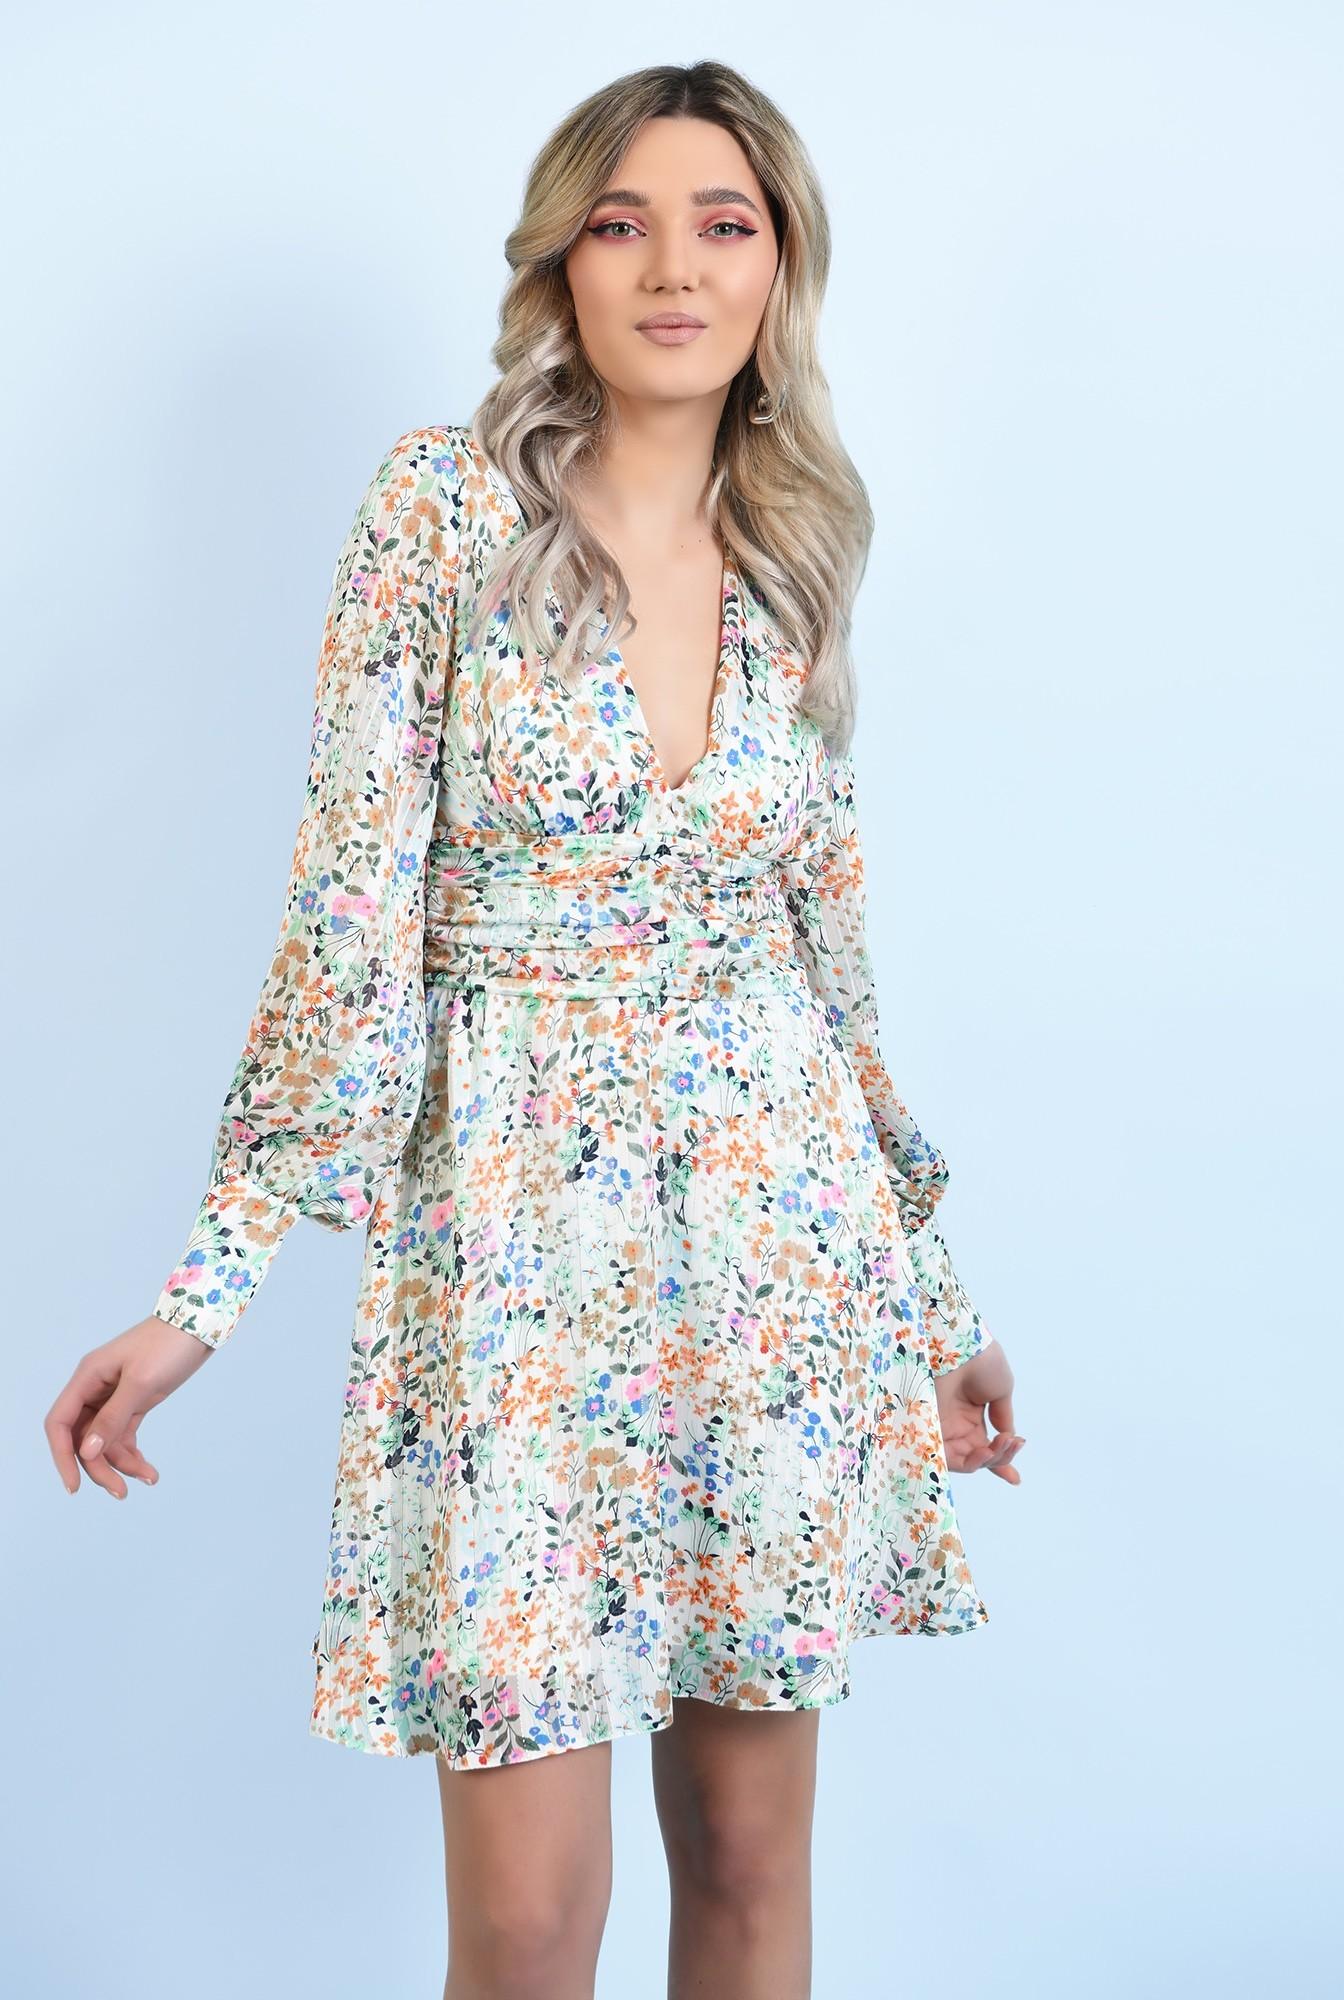 0 - 360 - rochie mini, din sifon, cu flori, maneci lungi, betelie fronsata